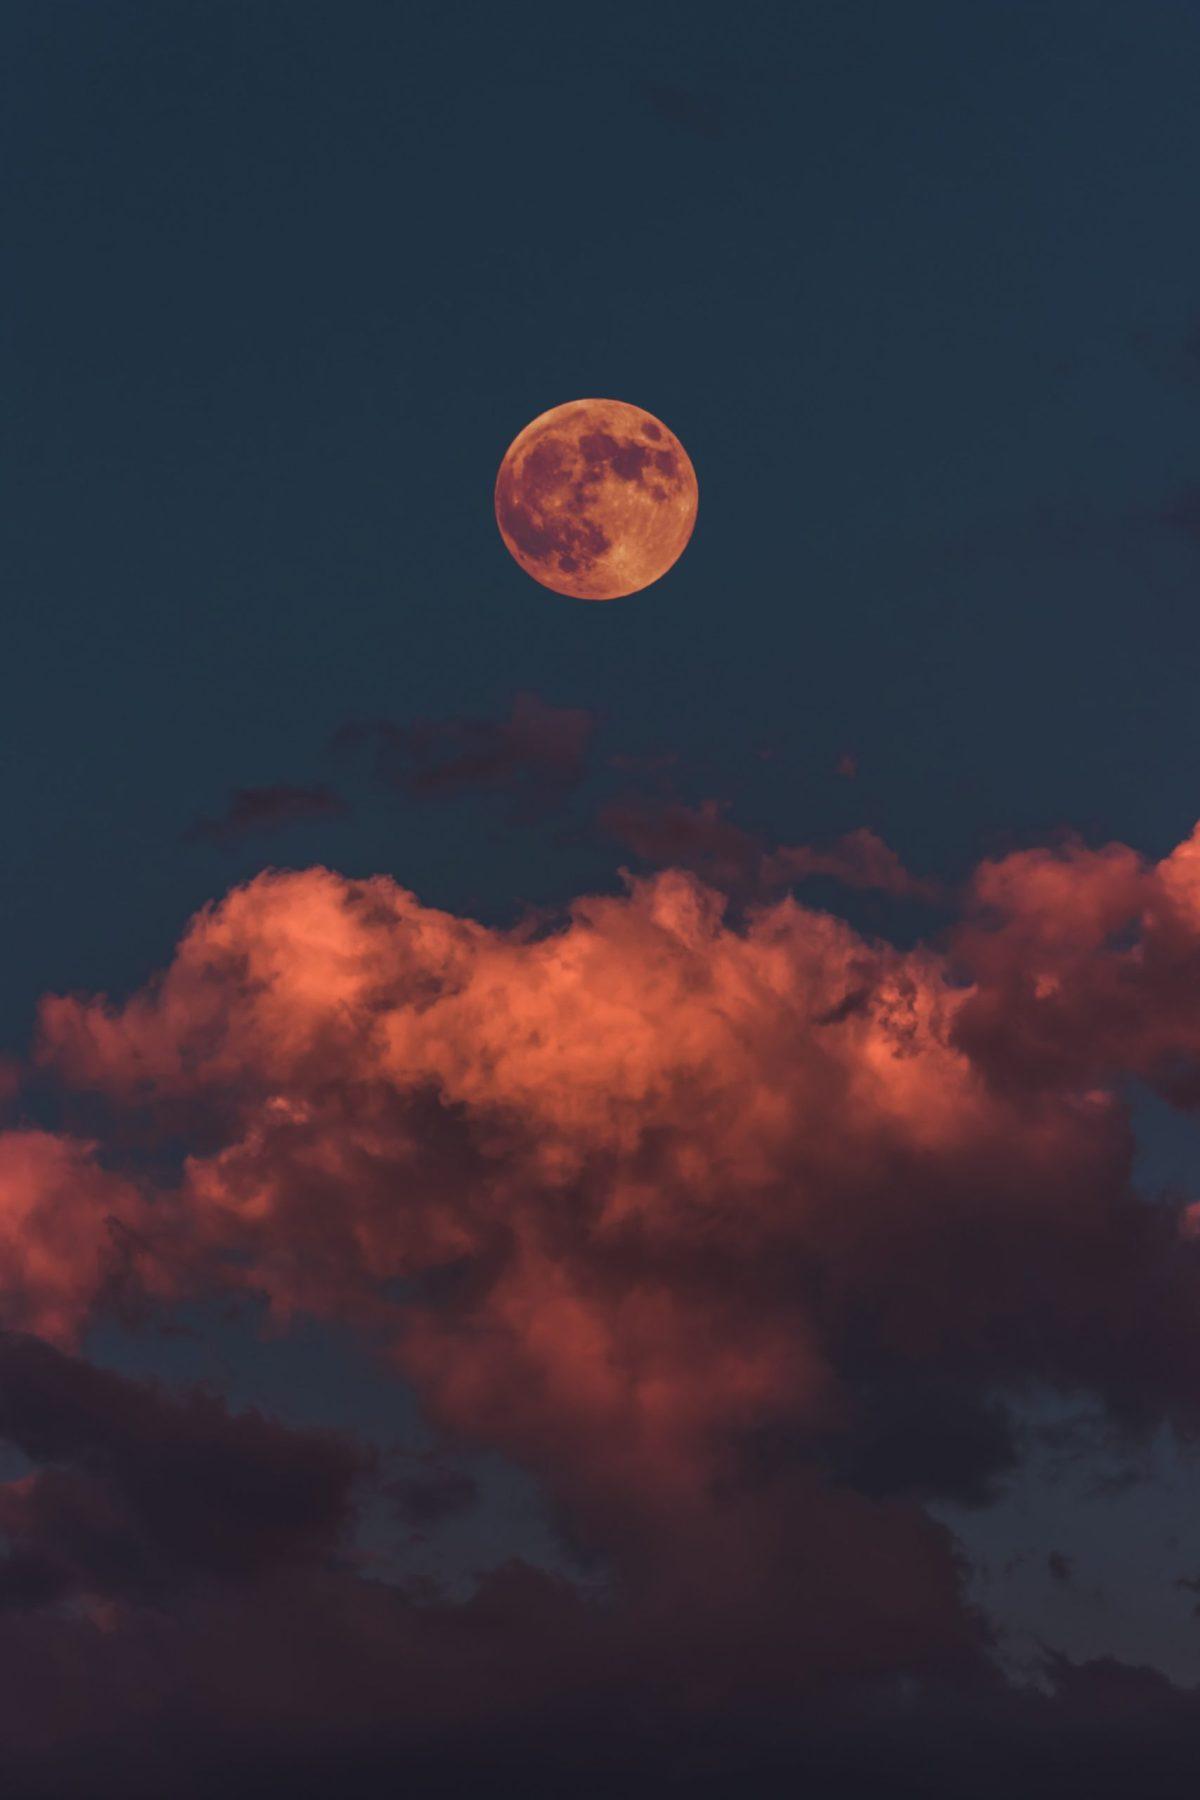 Orange Moon and clouds in a darkening sky